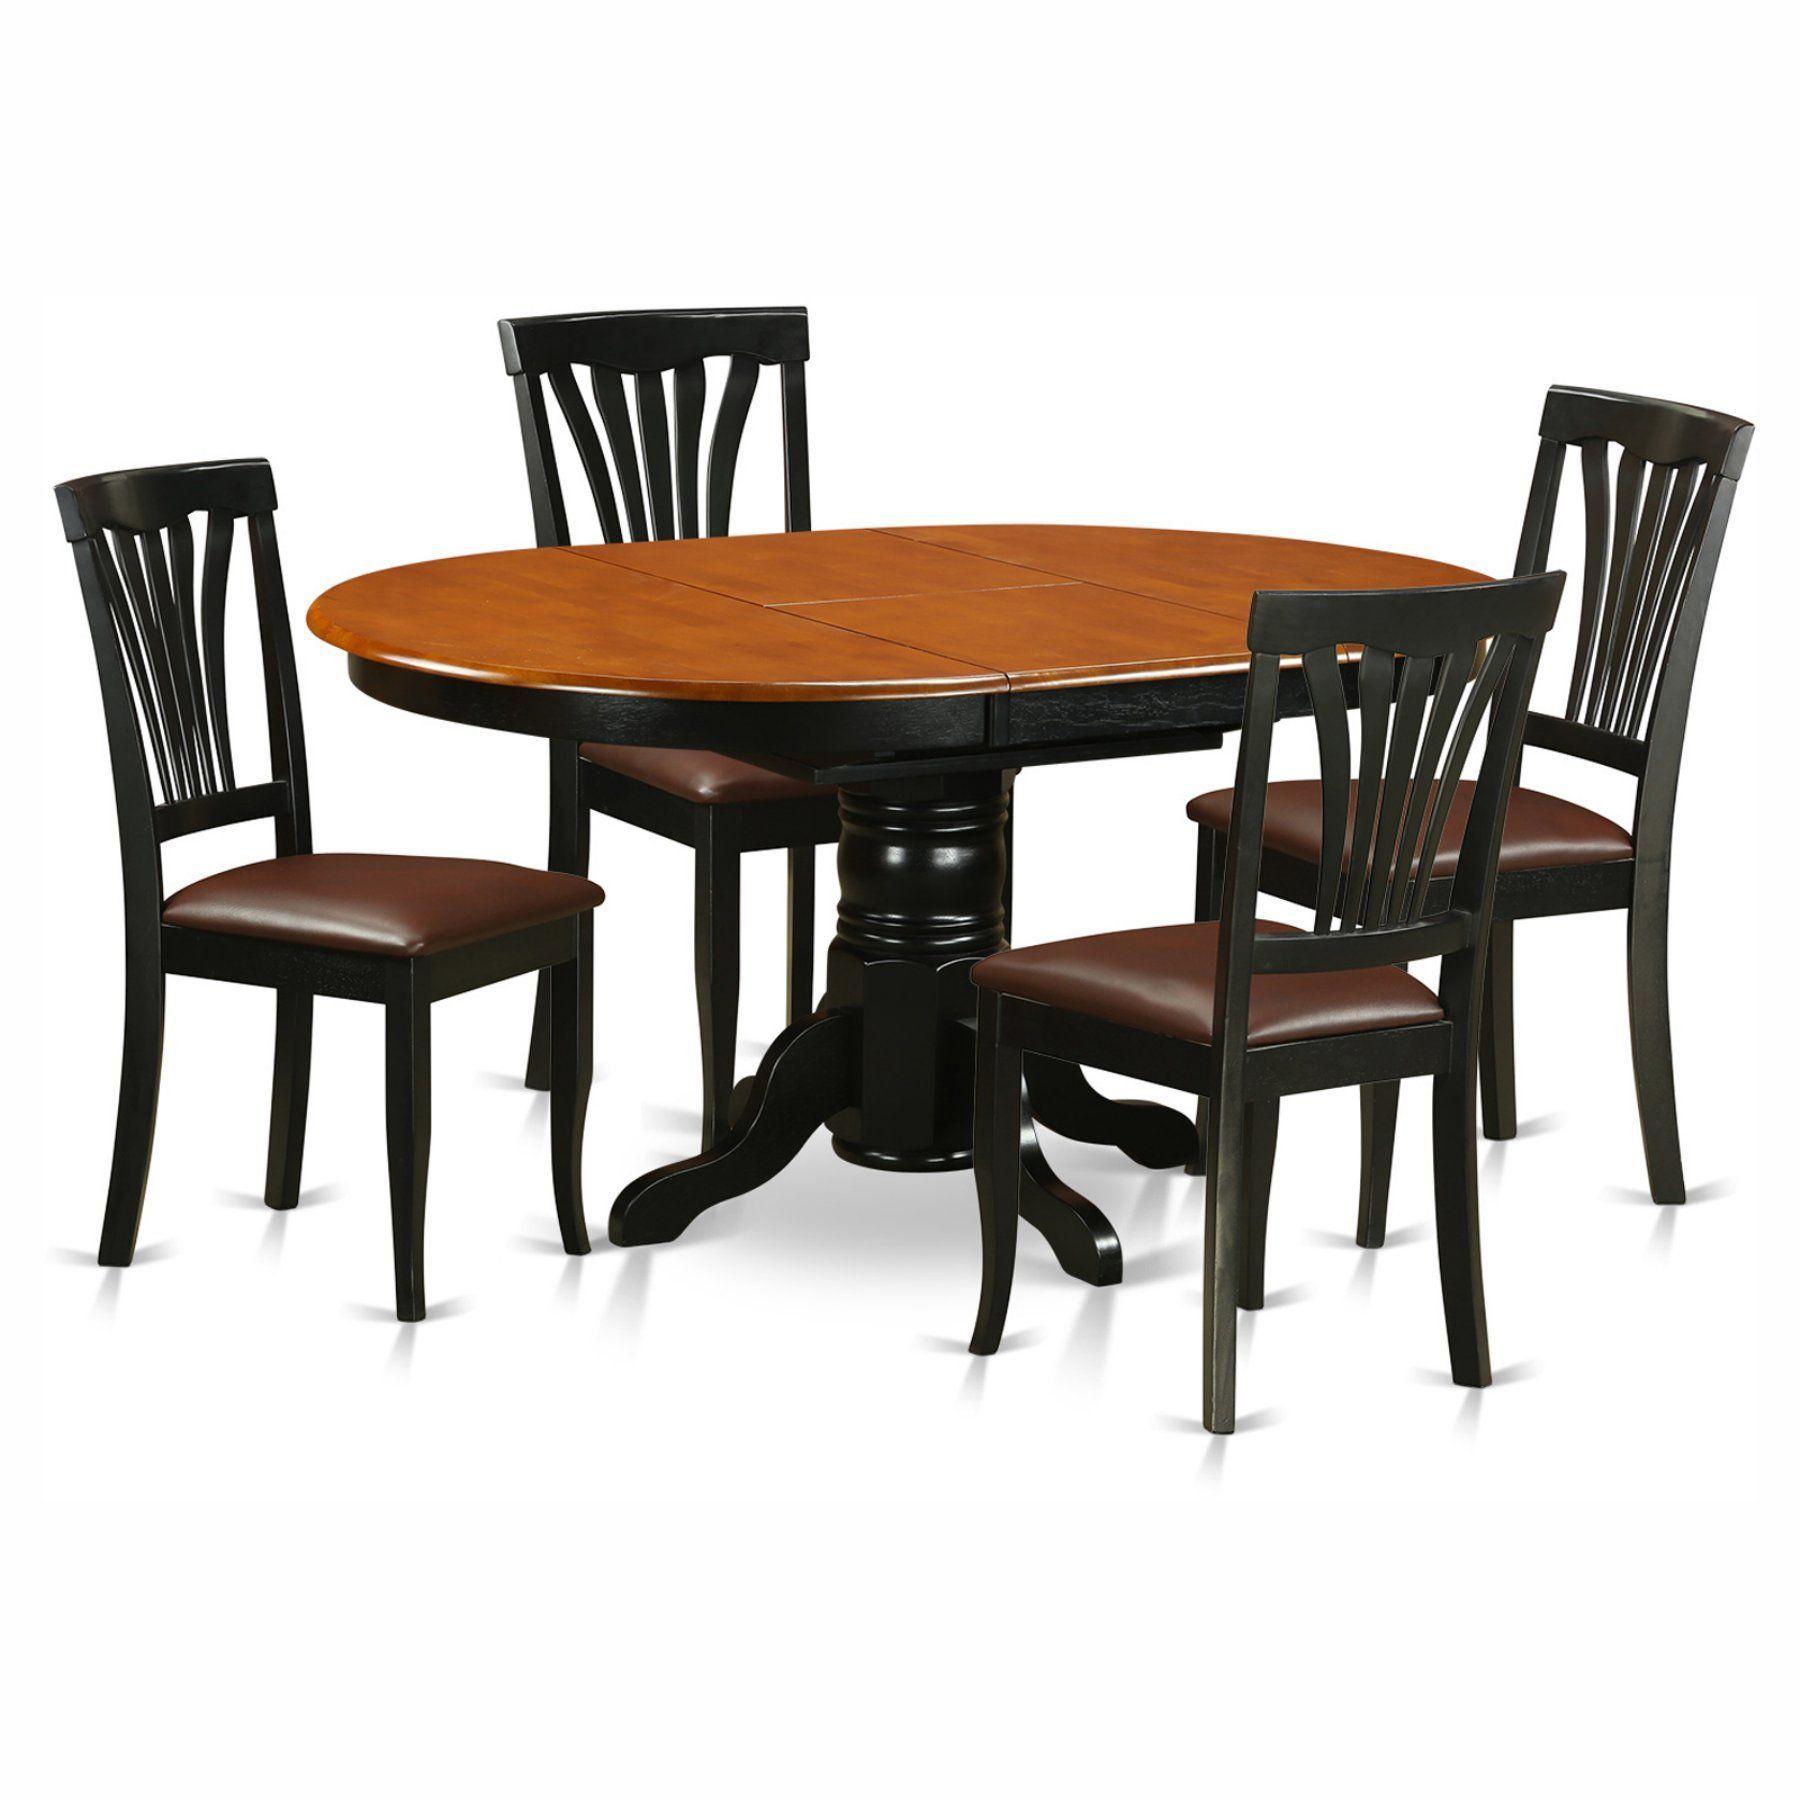 East West Furniture Avon 5 Piece Pedestal Oval Dining Table Set Pleasing Oval Dining Room Table Set Design Decoration